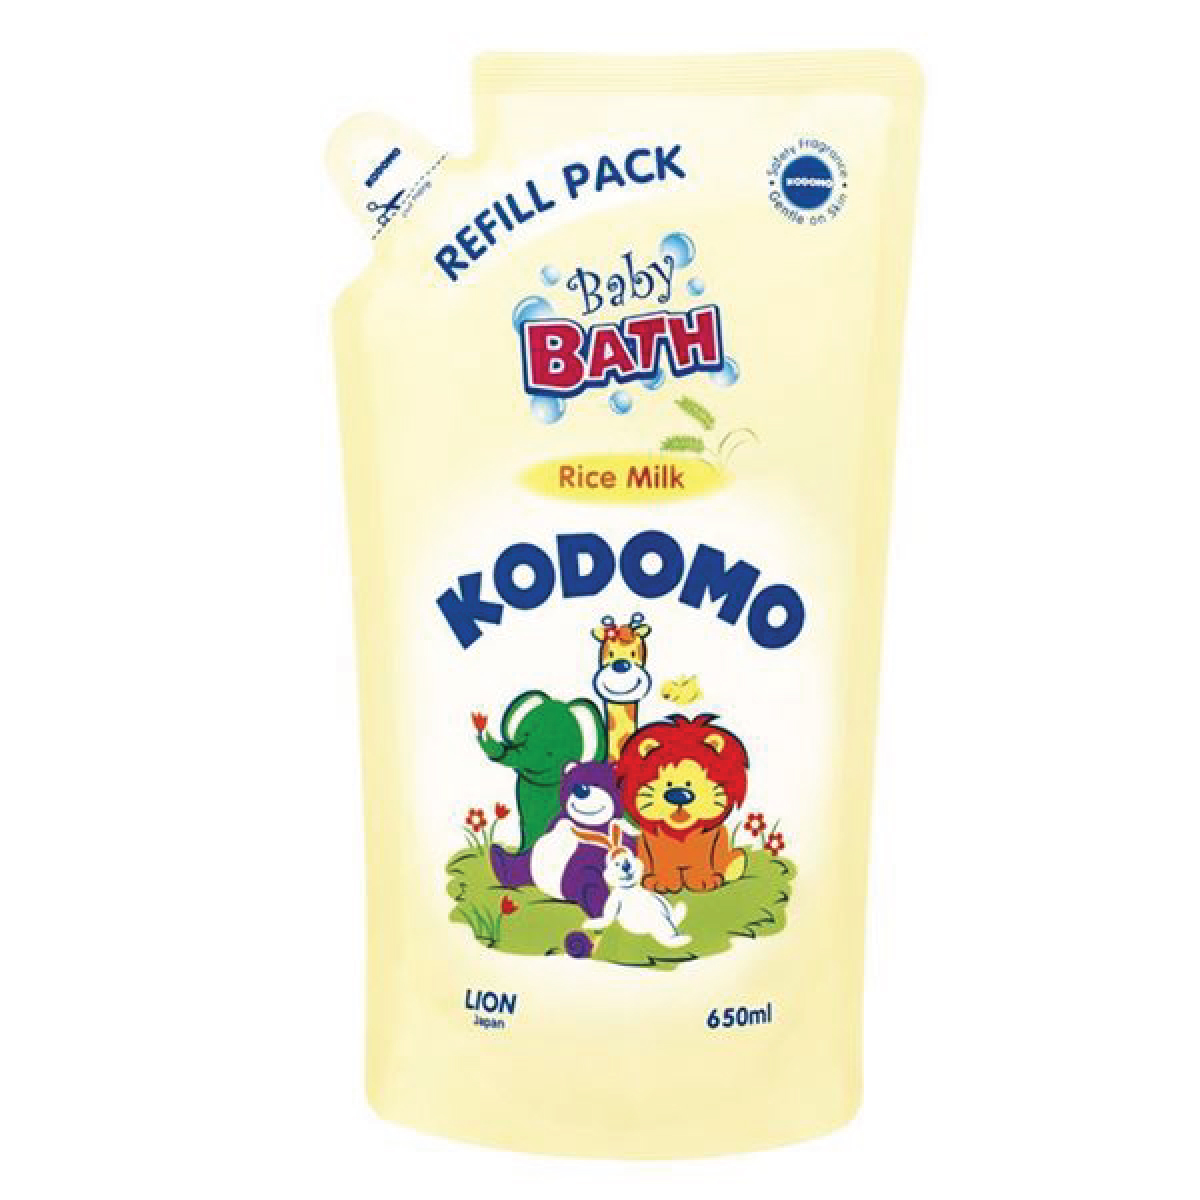 KODOMO Baby Bath Rice Milk Refill